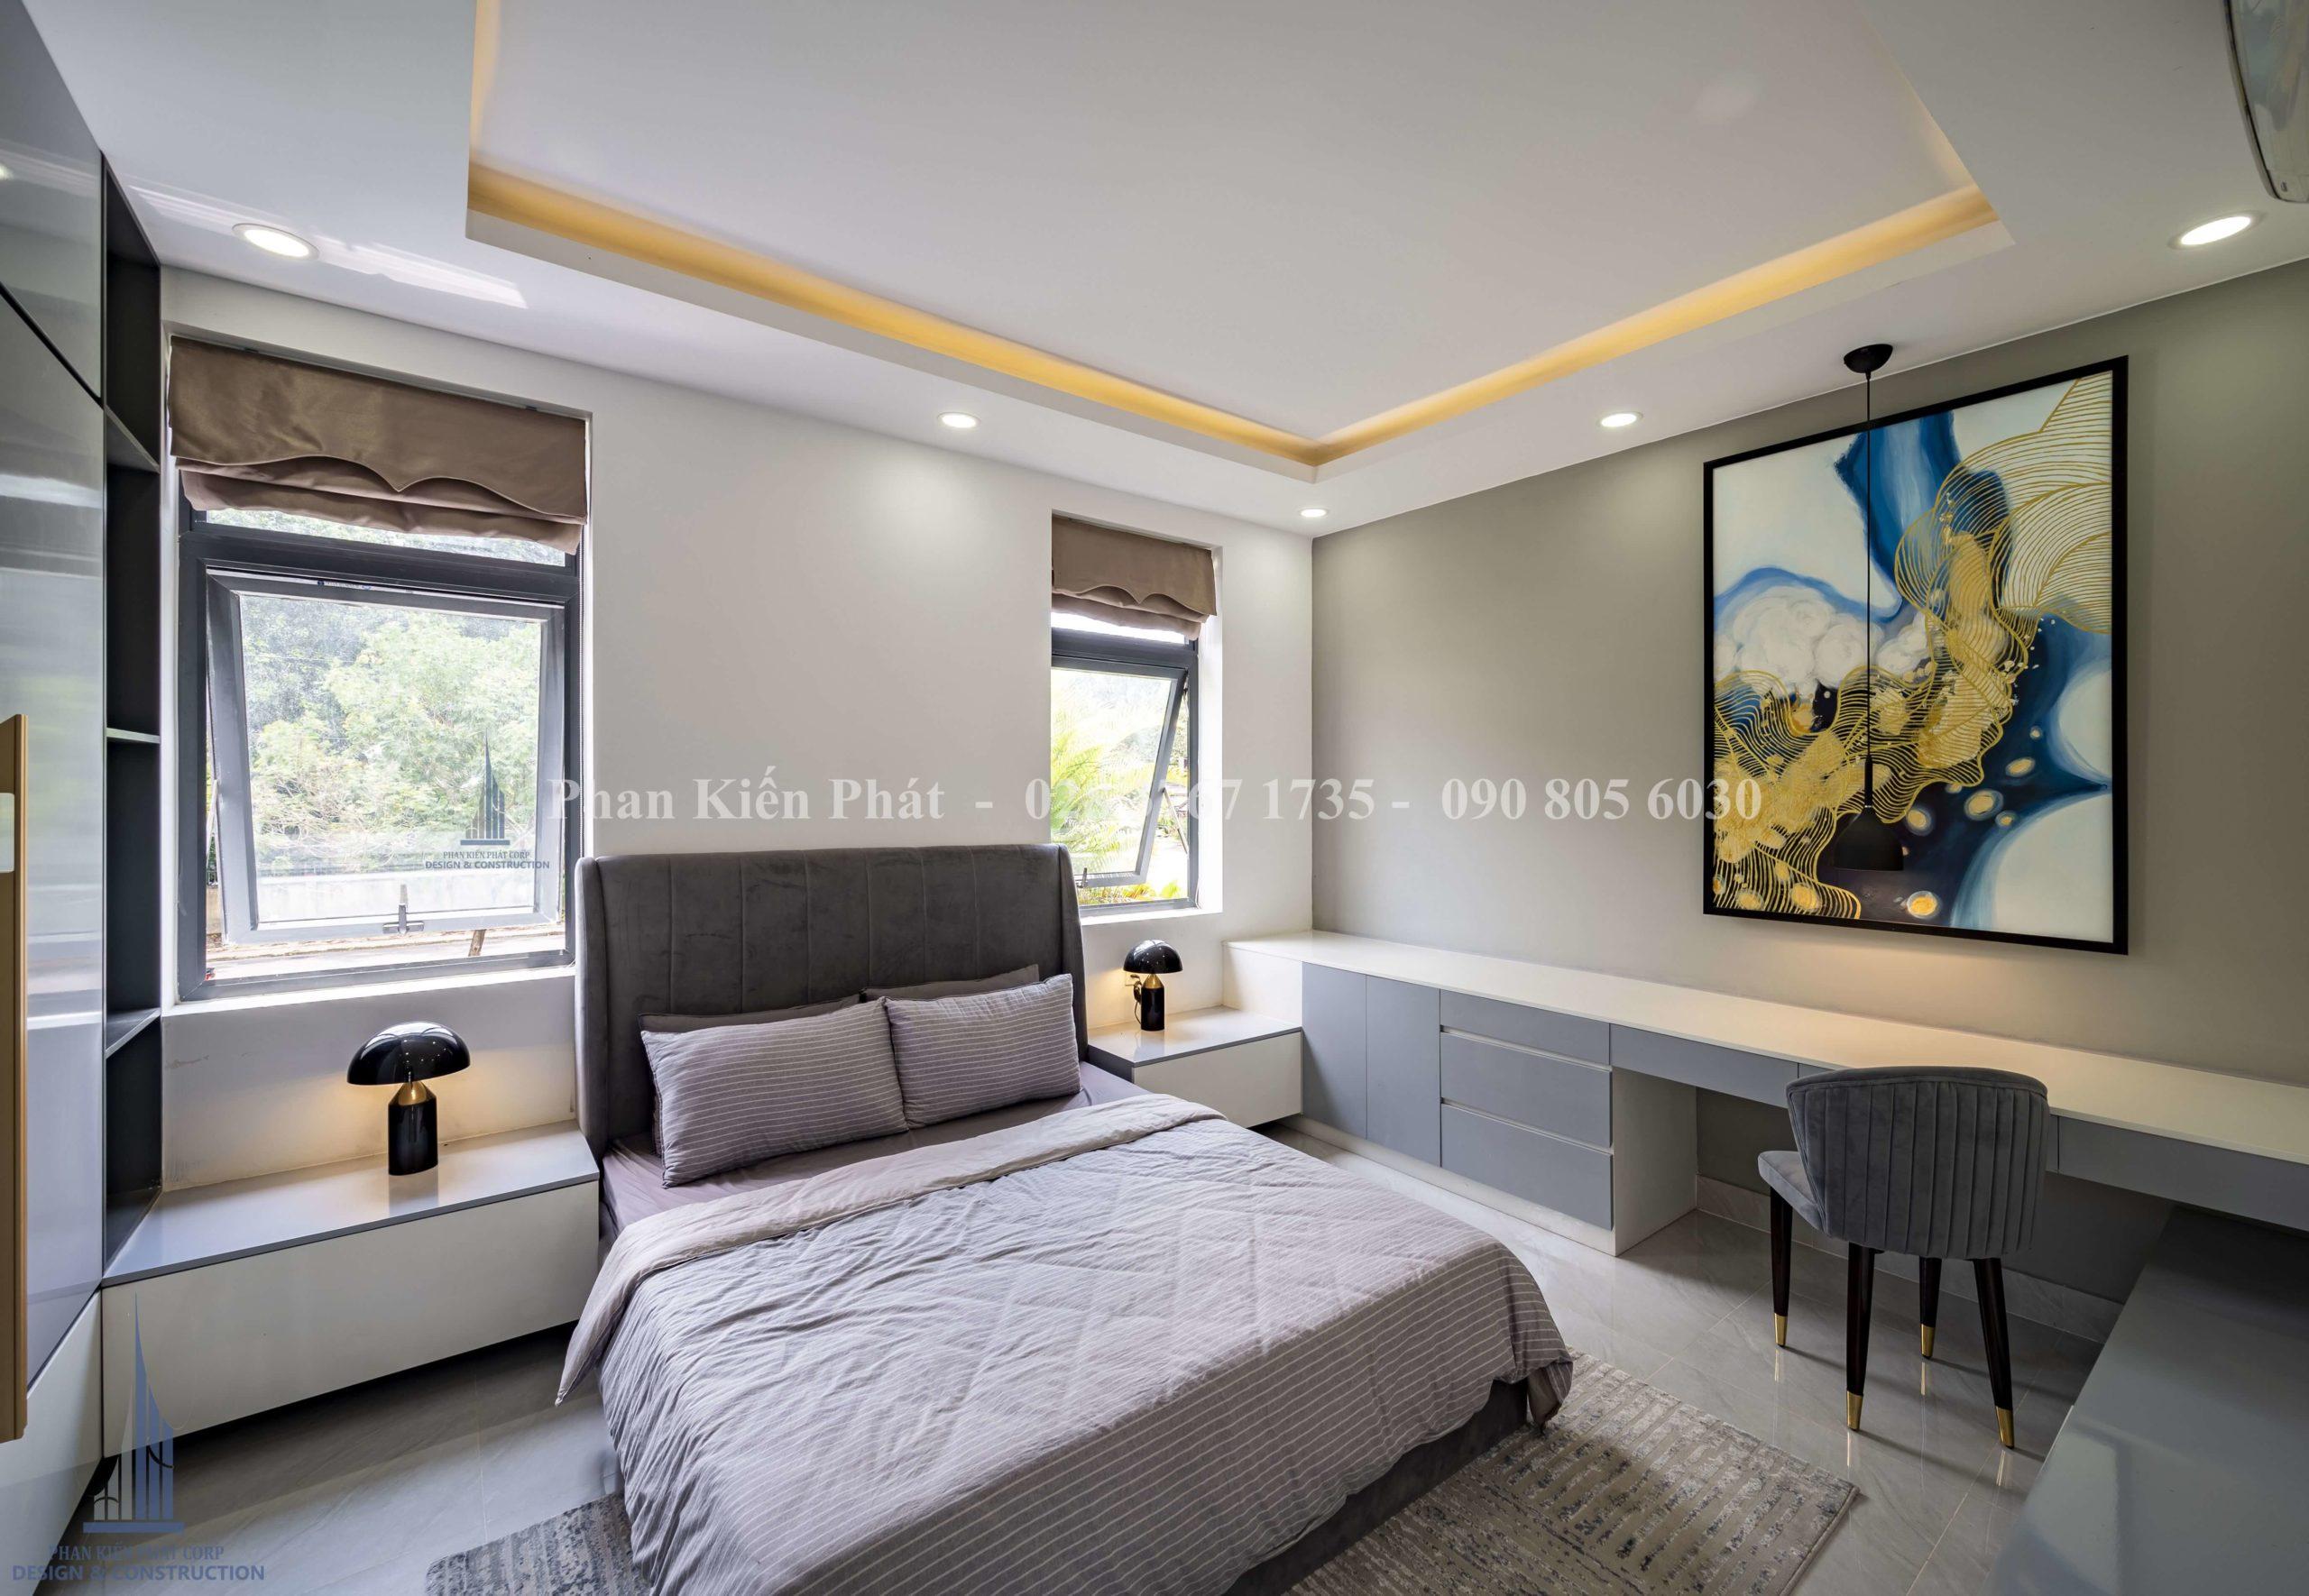 Hoan Thanh Thi Cong Noi That Biet Thu Hien Dai Dep Binh Phuoc 31 Tkxdnd